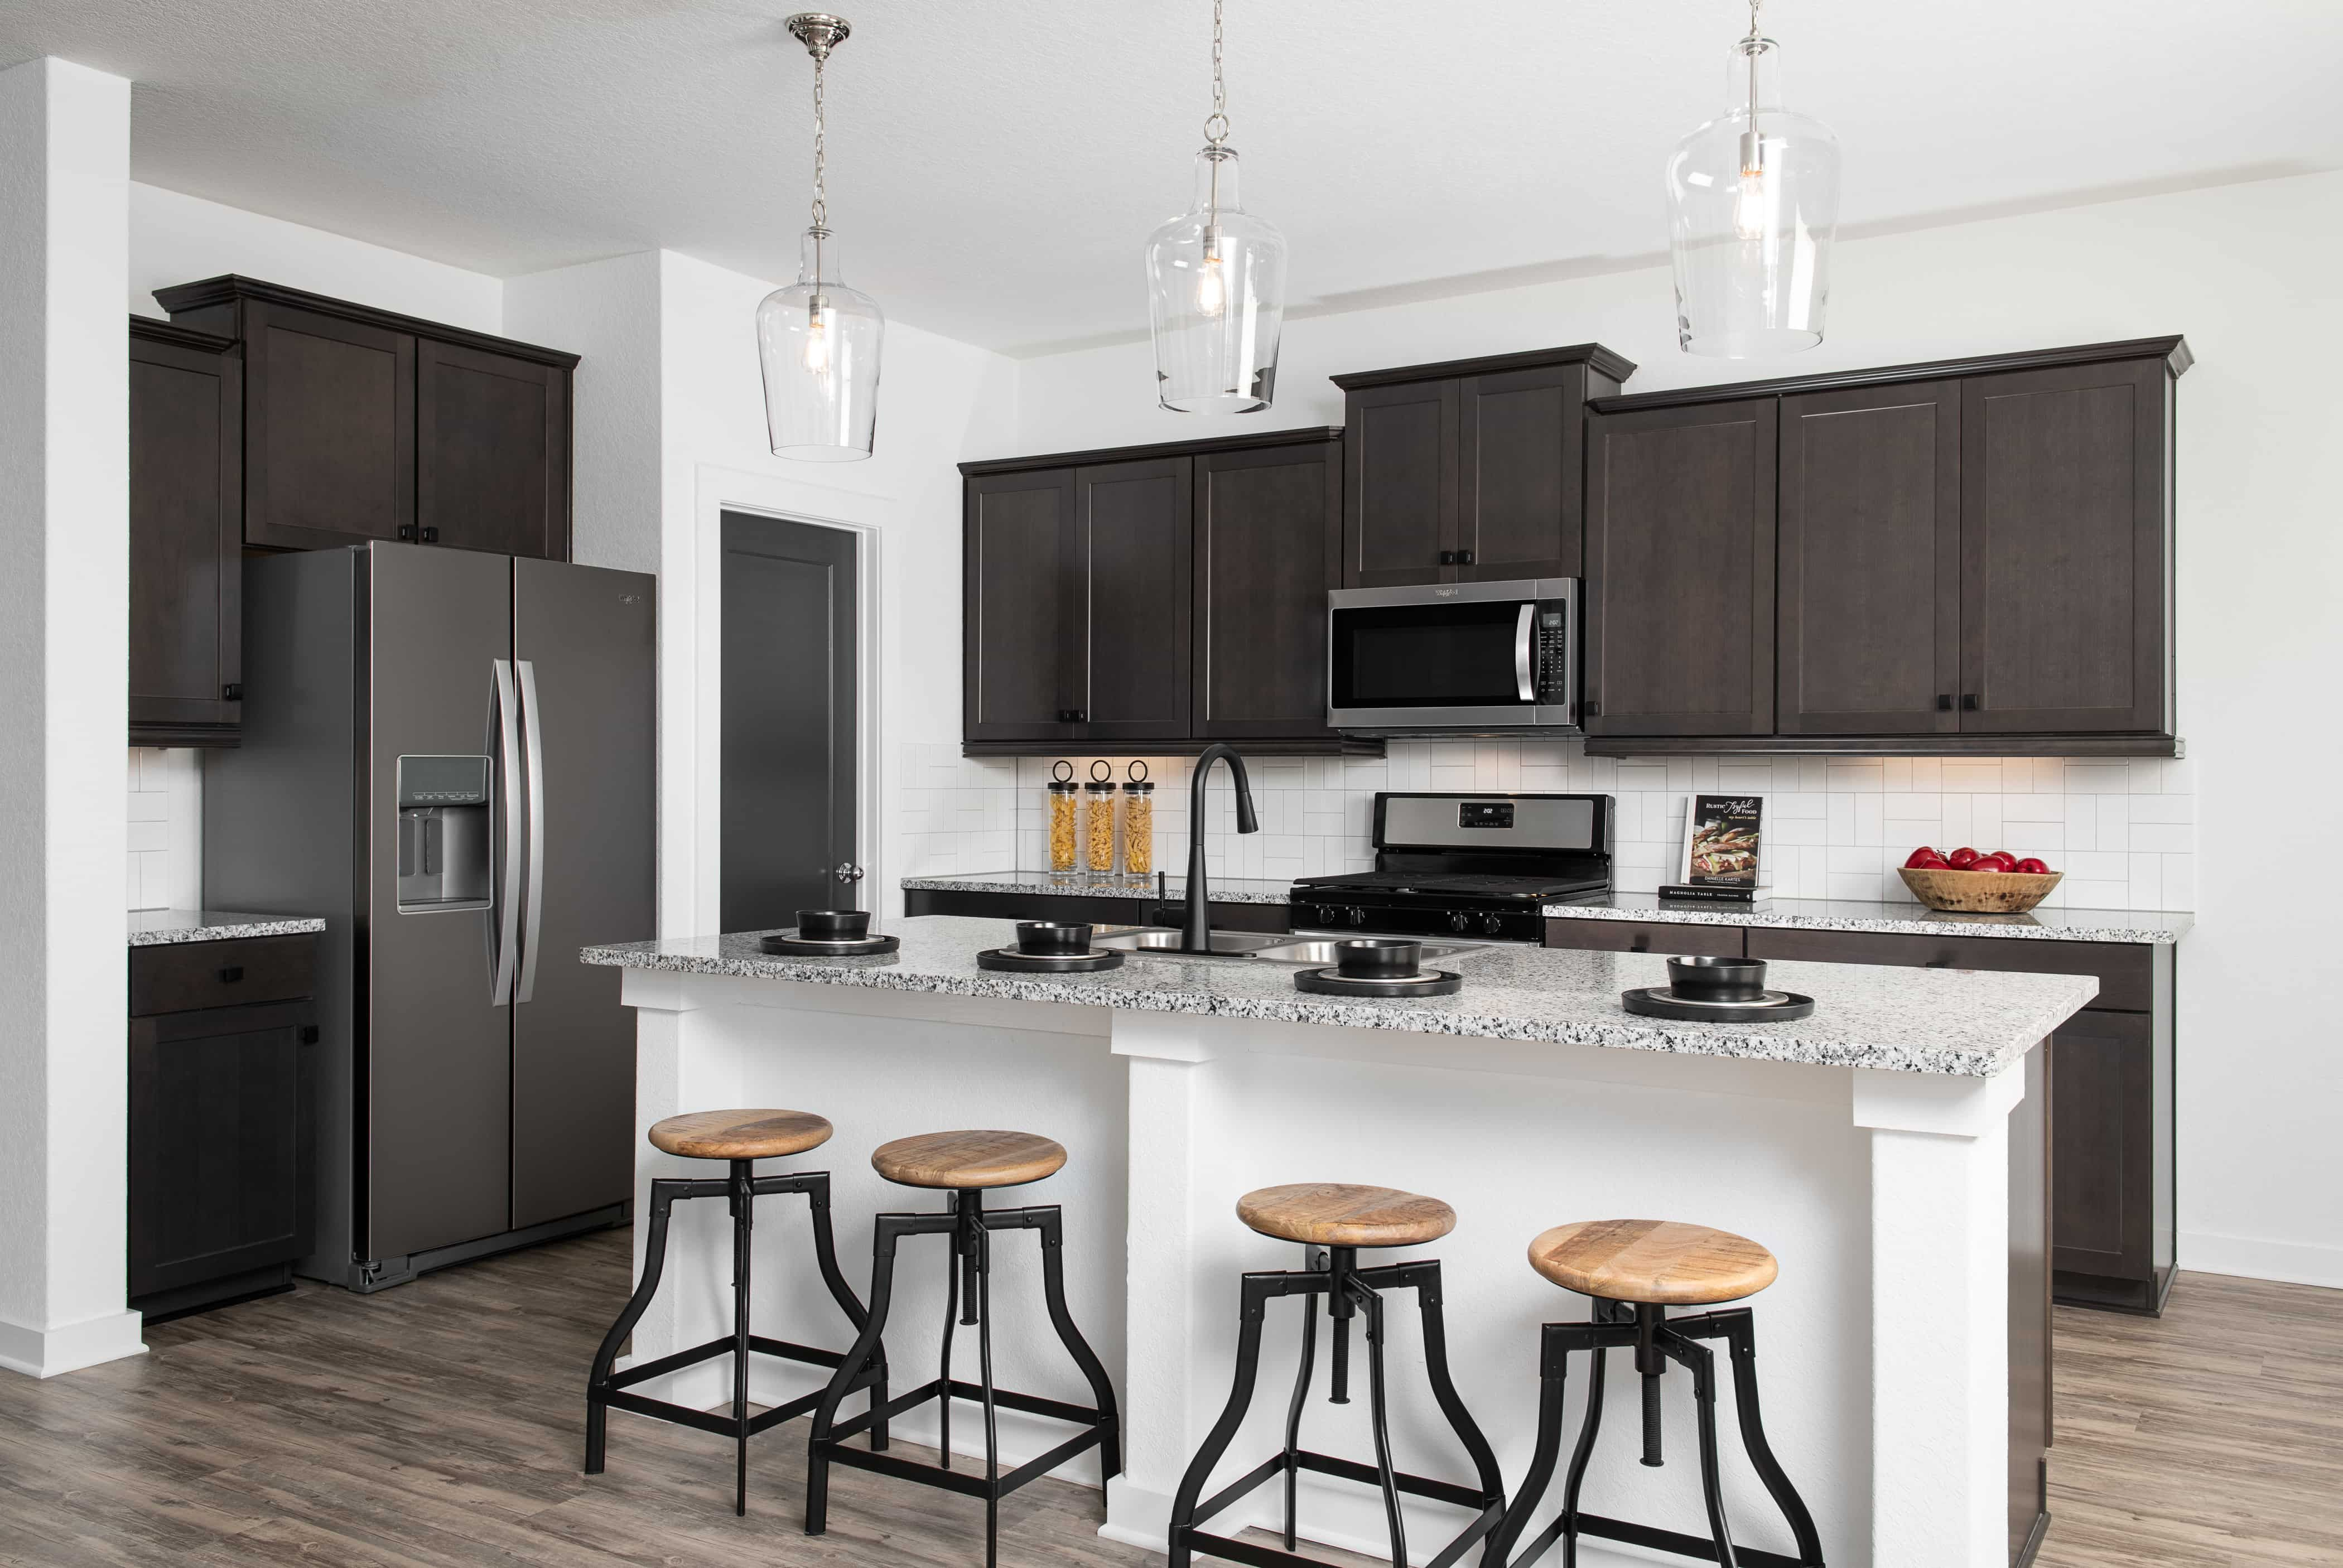 Kitchen featured in the Jordan By Ashton Woods in San Antonio, TX